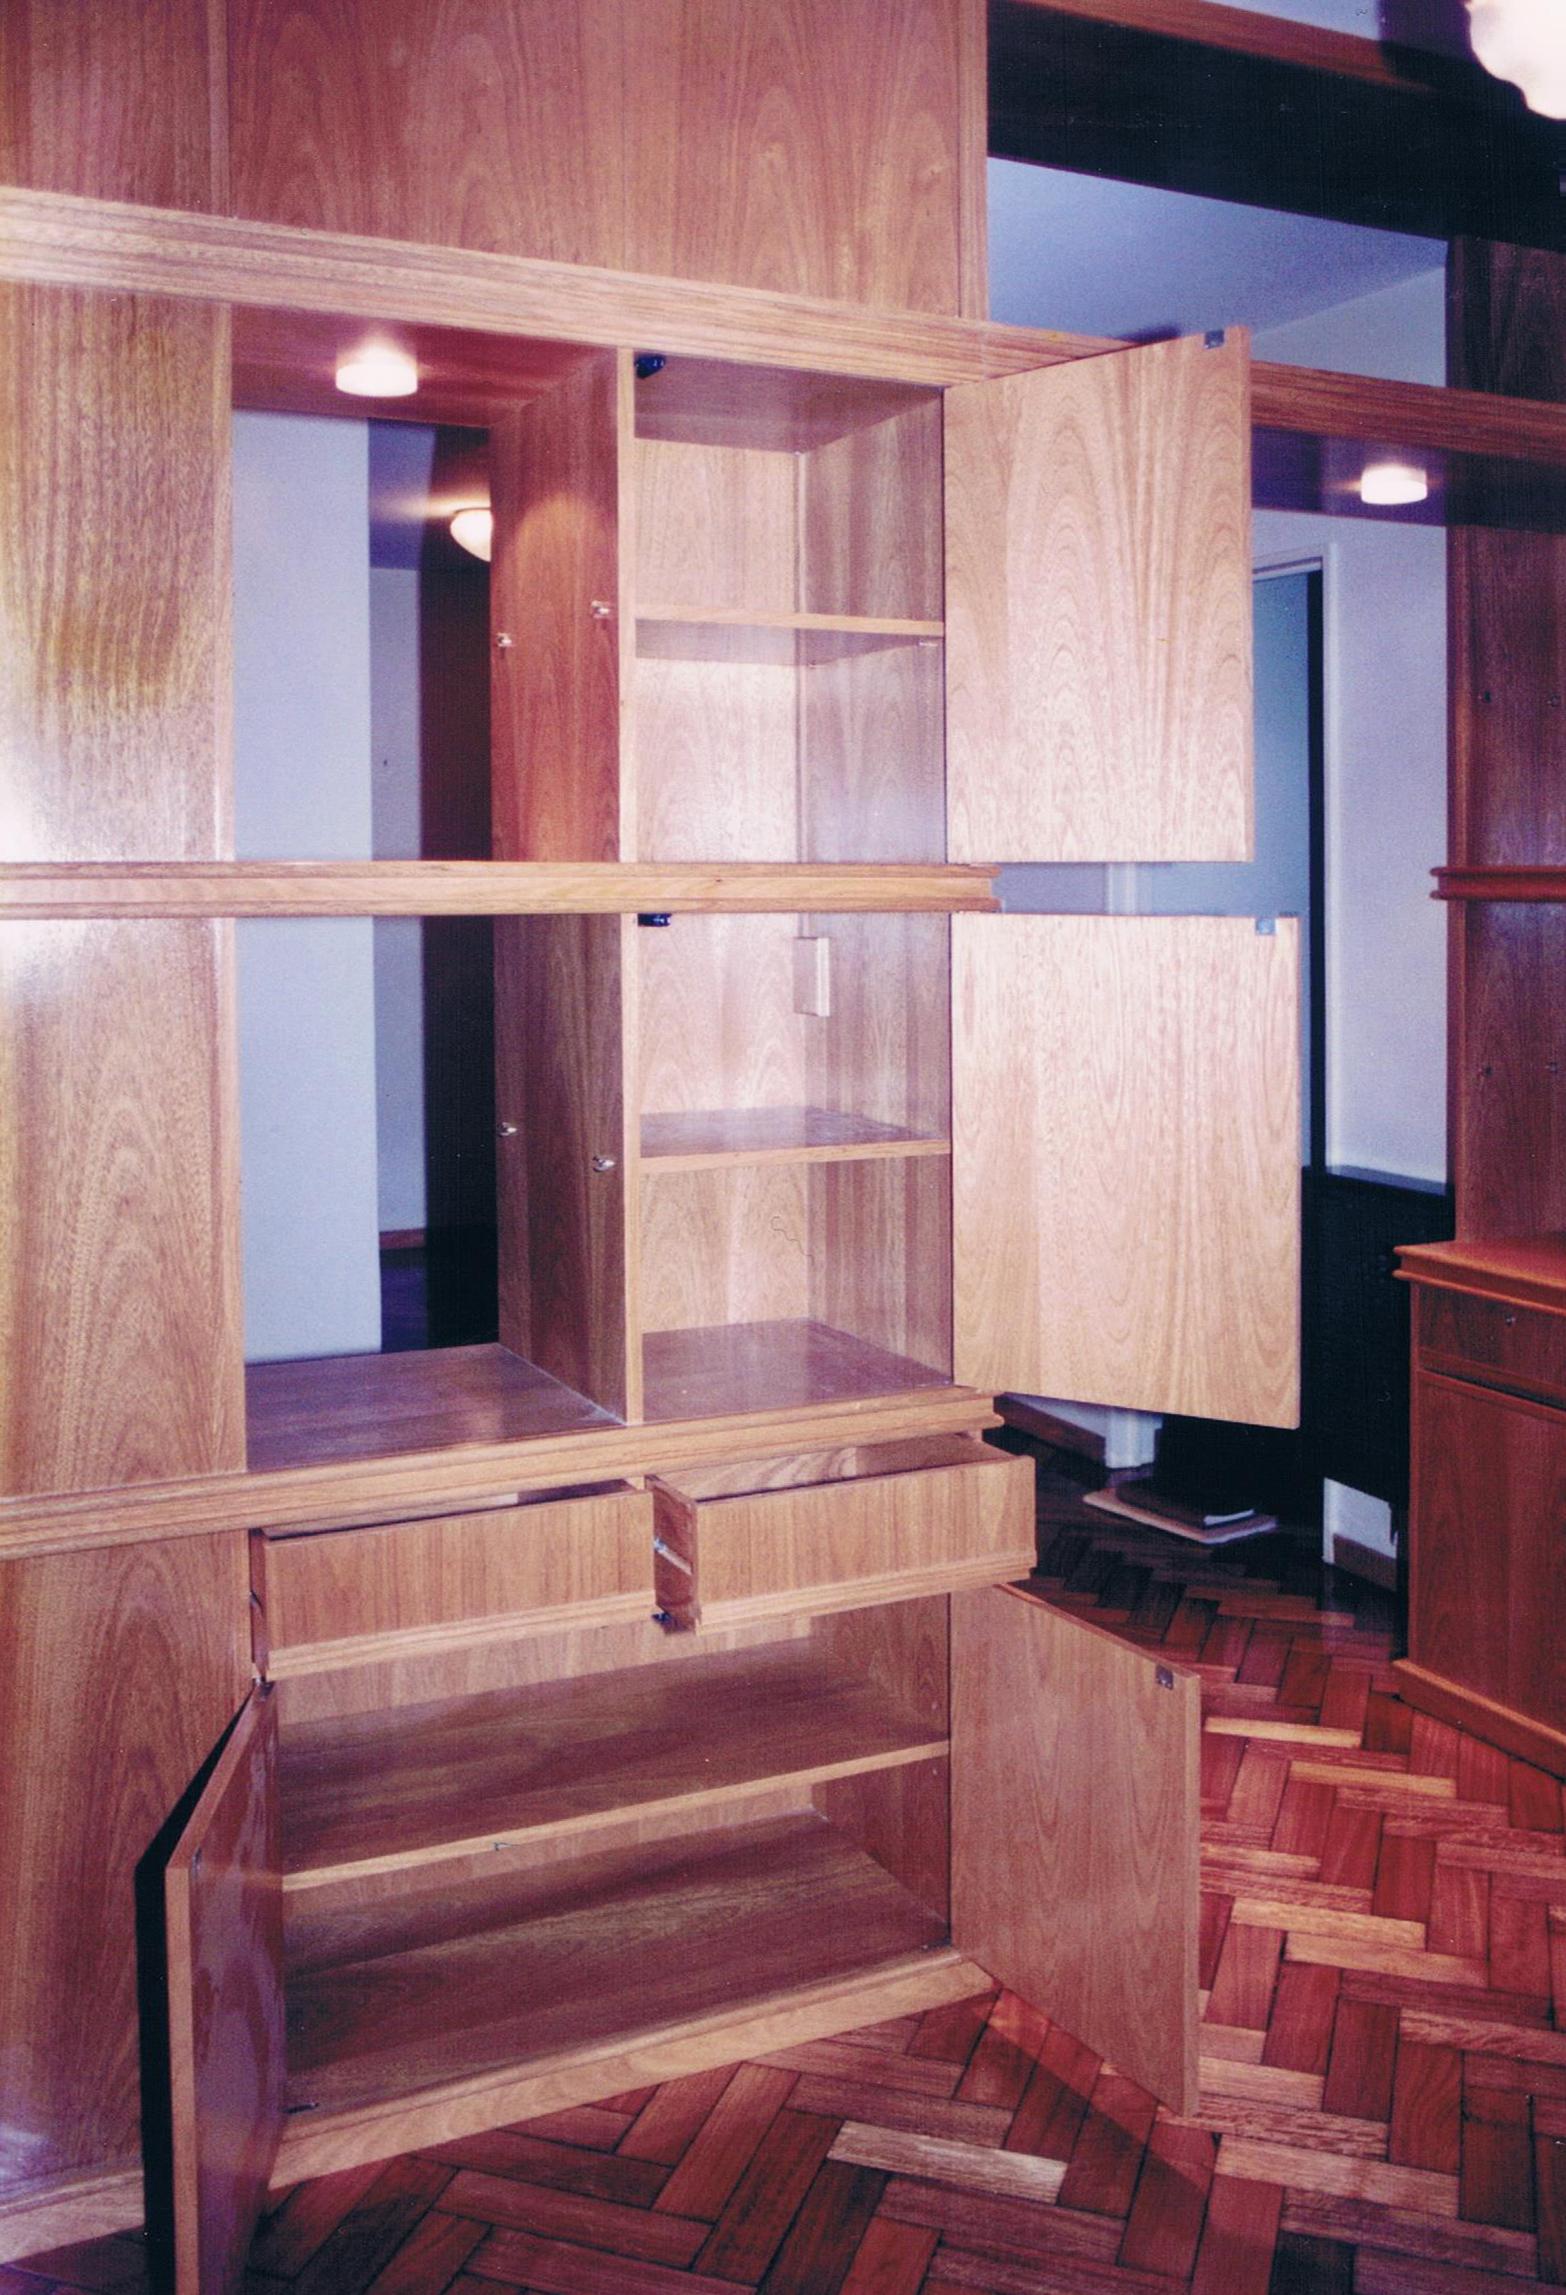 Mueble divisor 05-bis